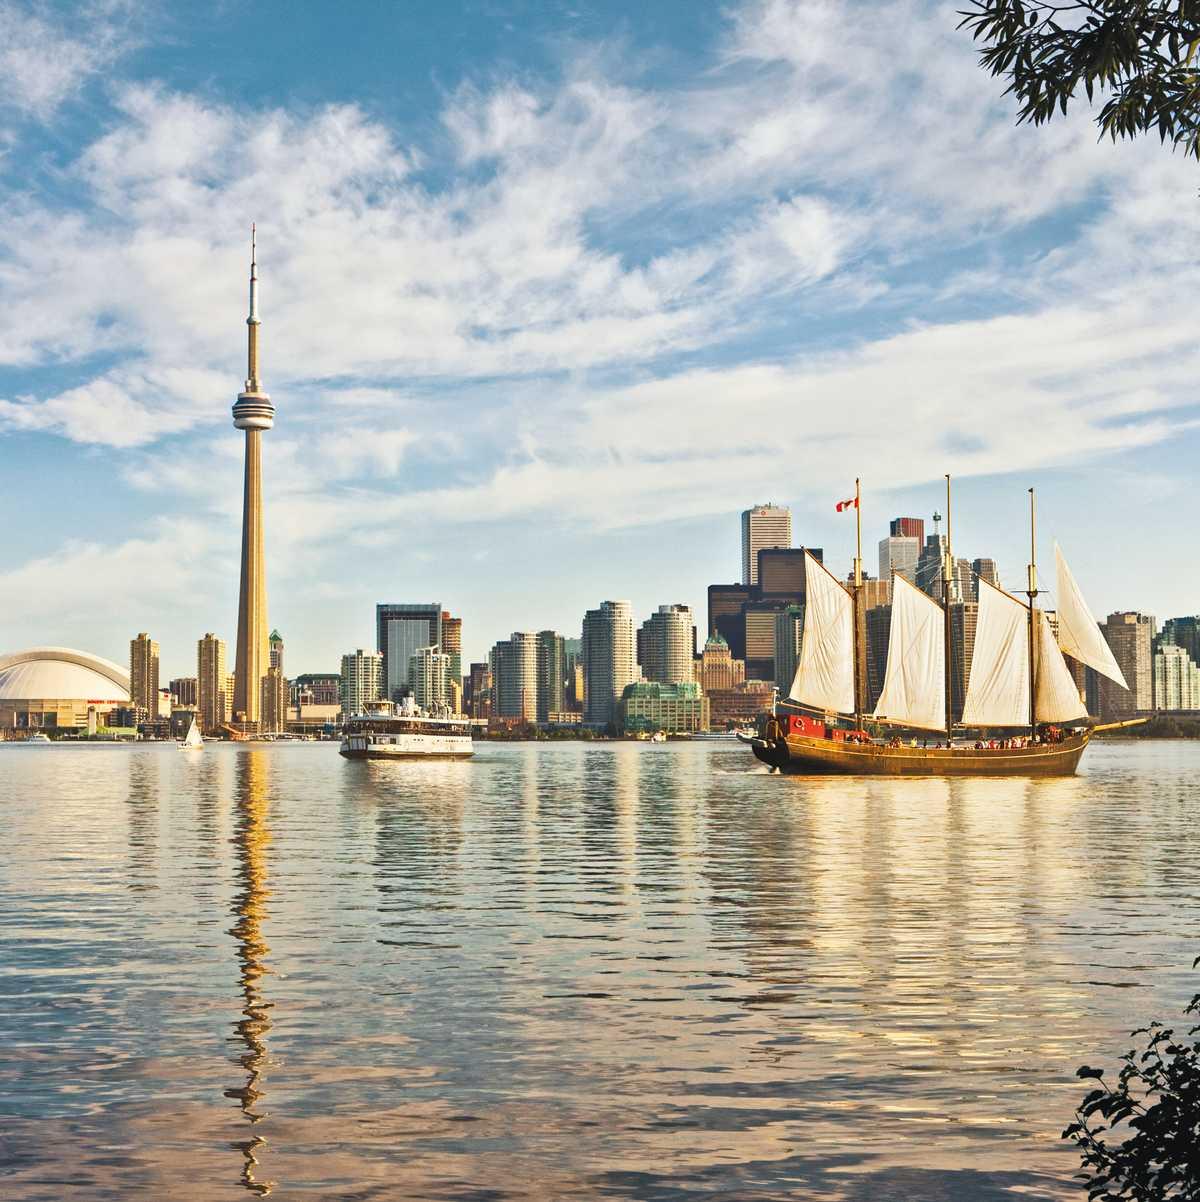 Toronto Urlaub: Individuellen Toronto Urlaub buchen! | CANUSA